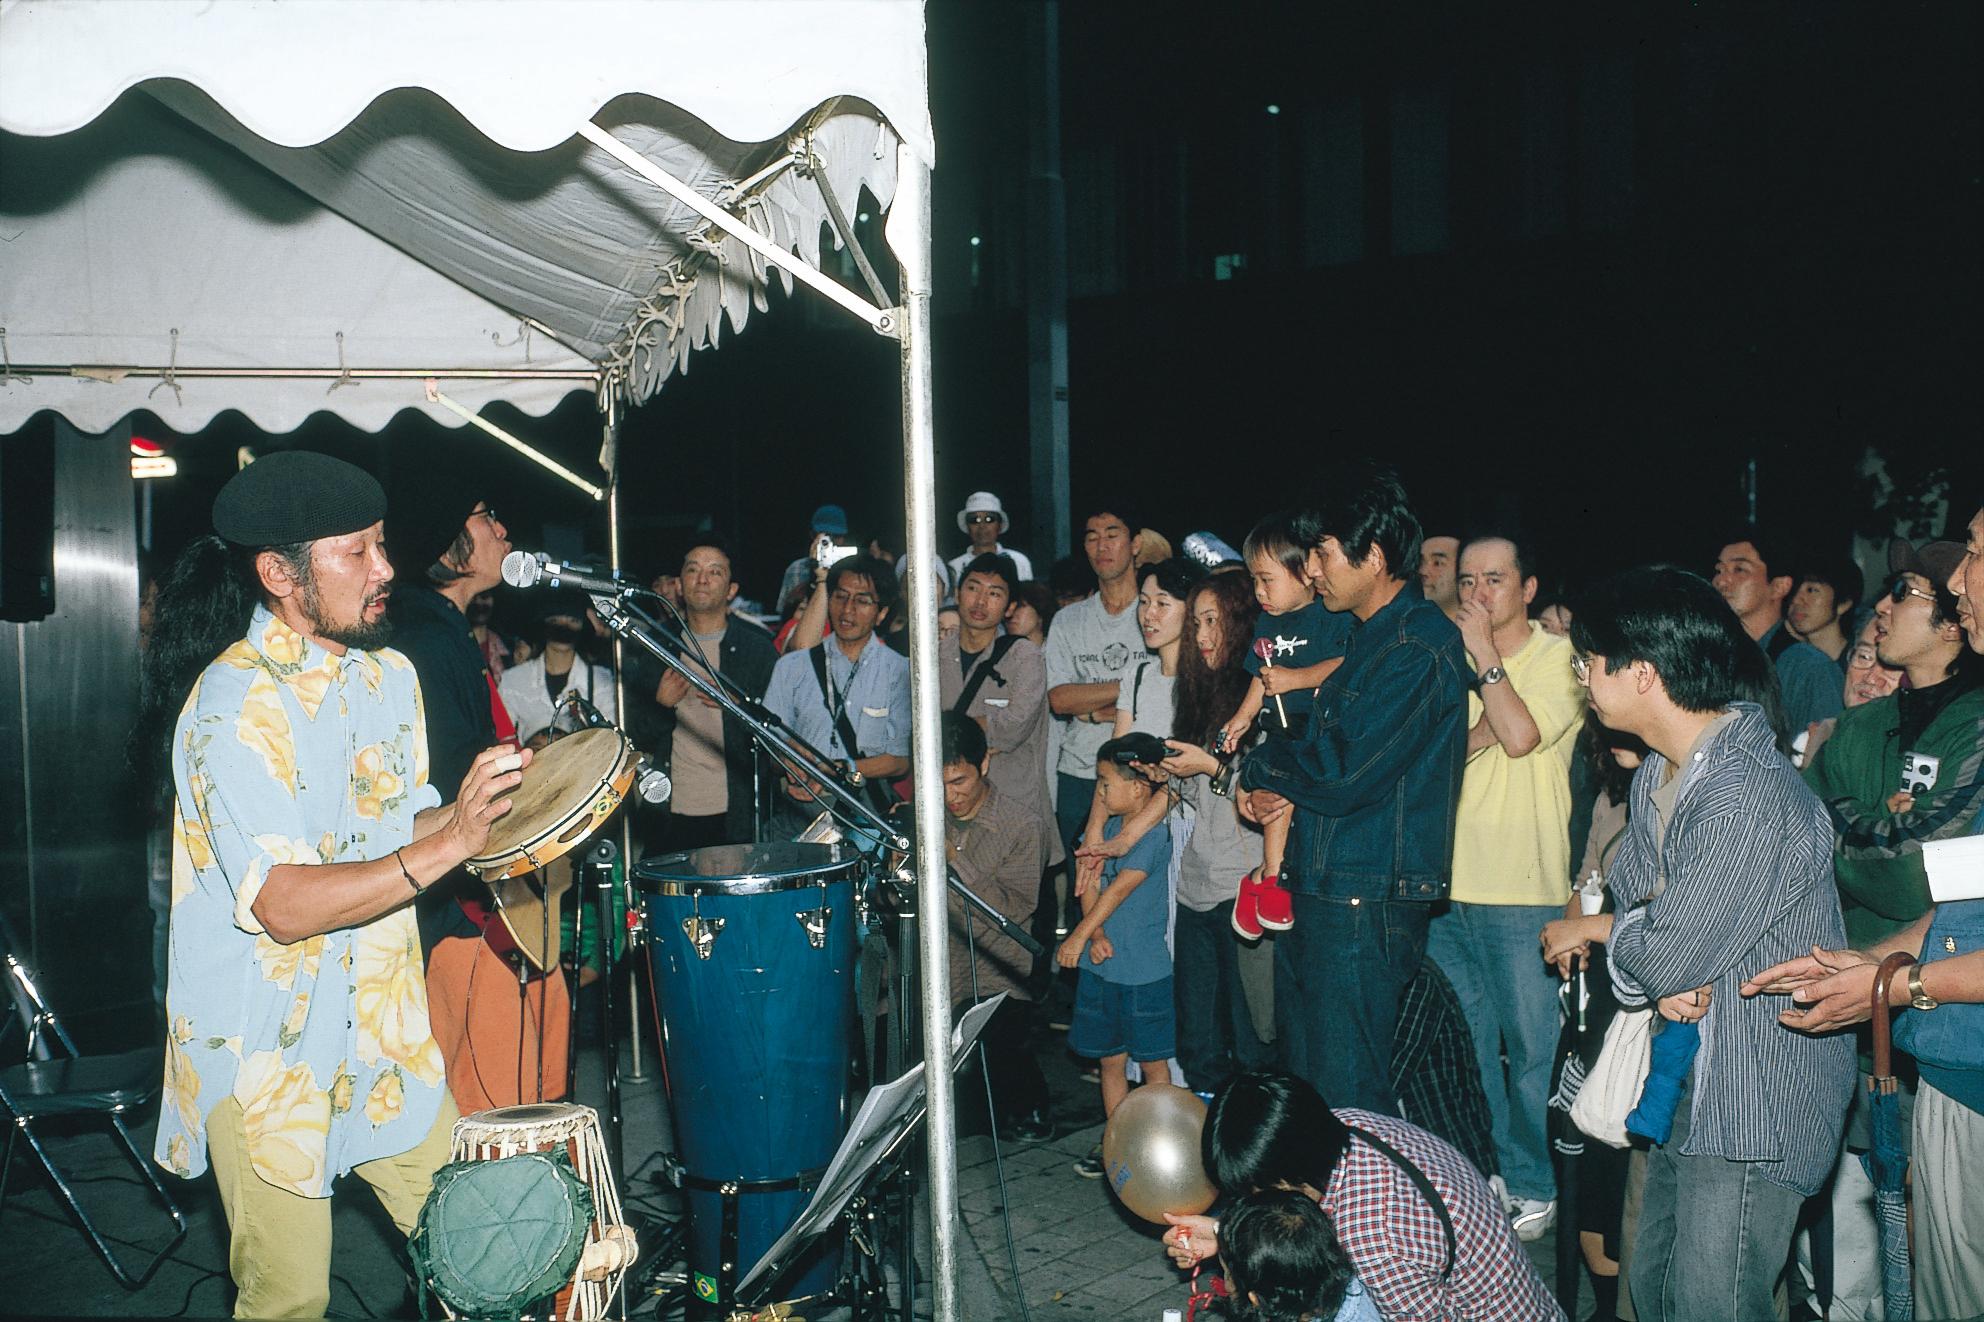 No.010354 定禅寺ストリートJAZZフェスティバル